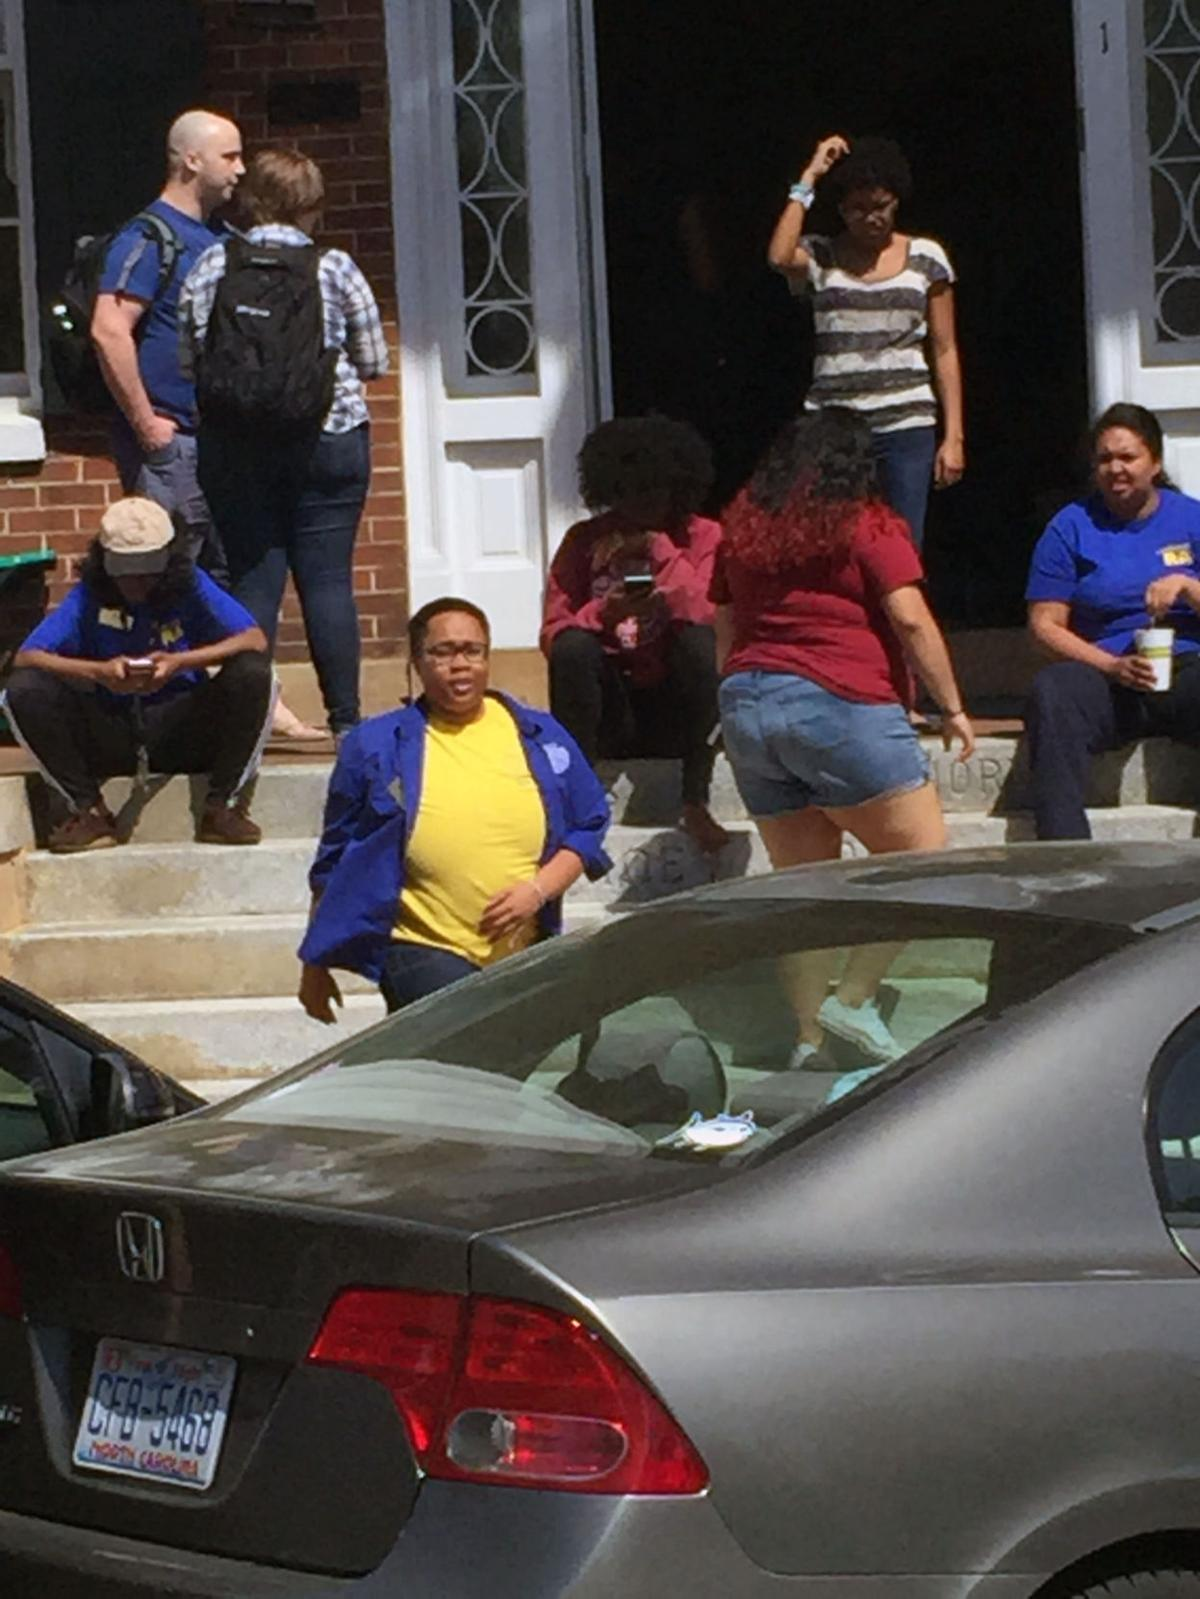 Salem College protest 2